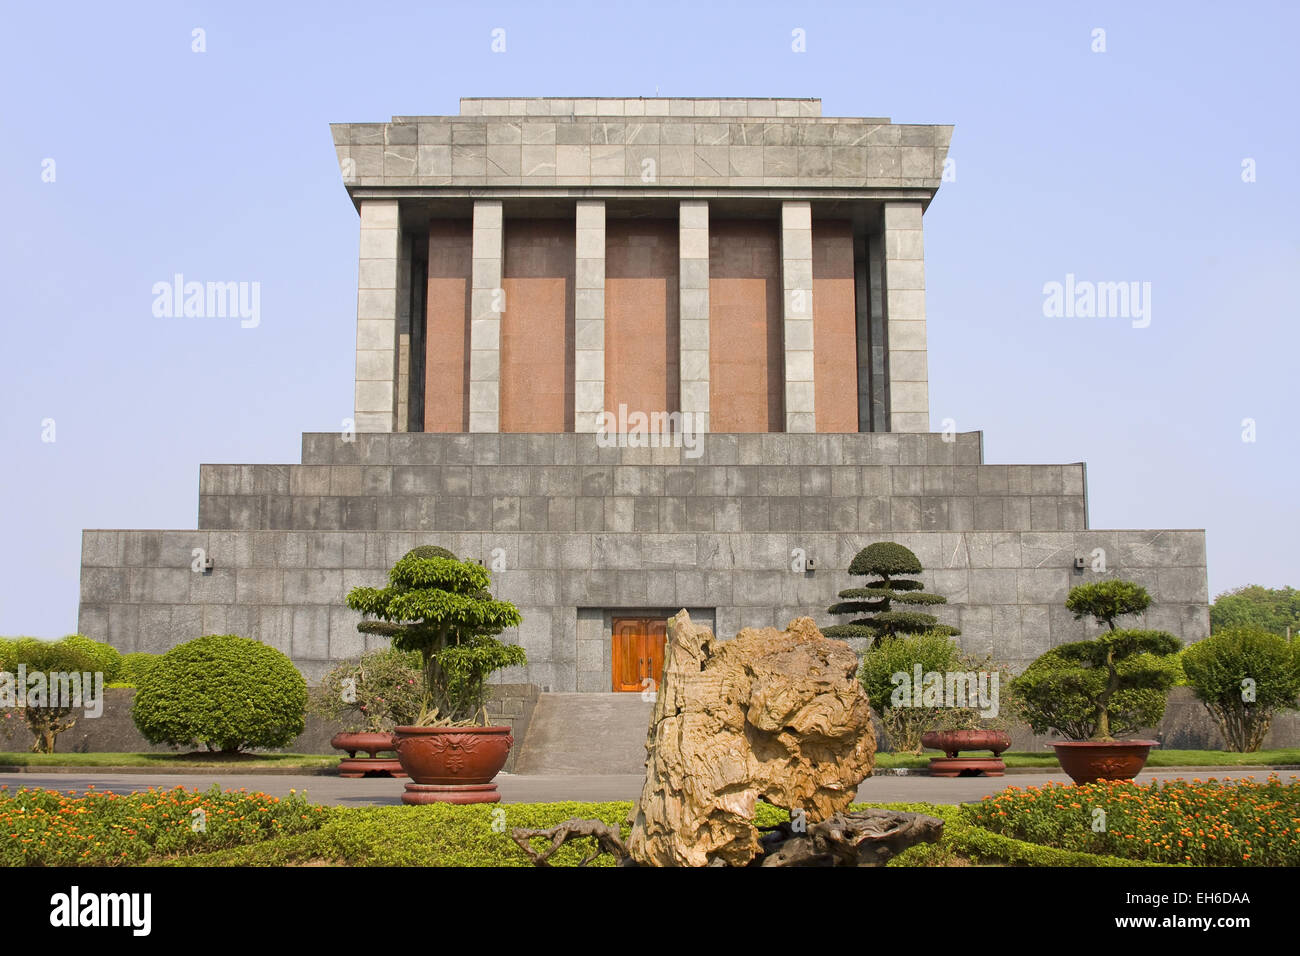 Ho Chi Minh Mausoleum in Hanoi, Vietnam - Stock Image